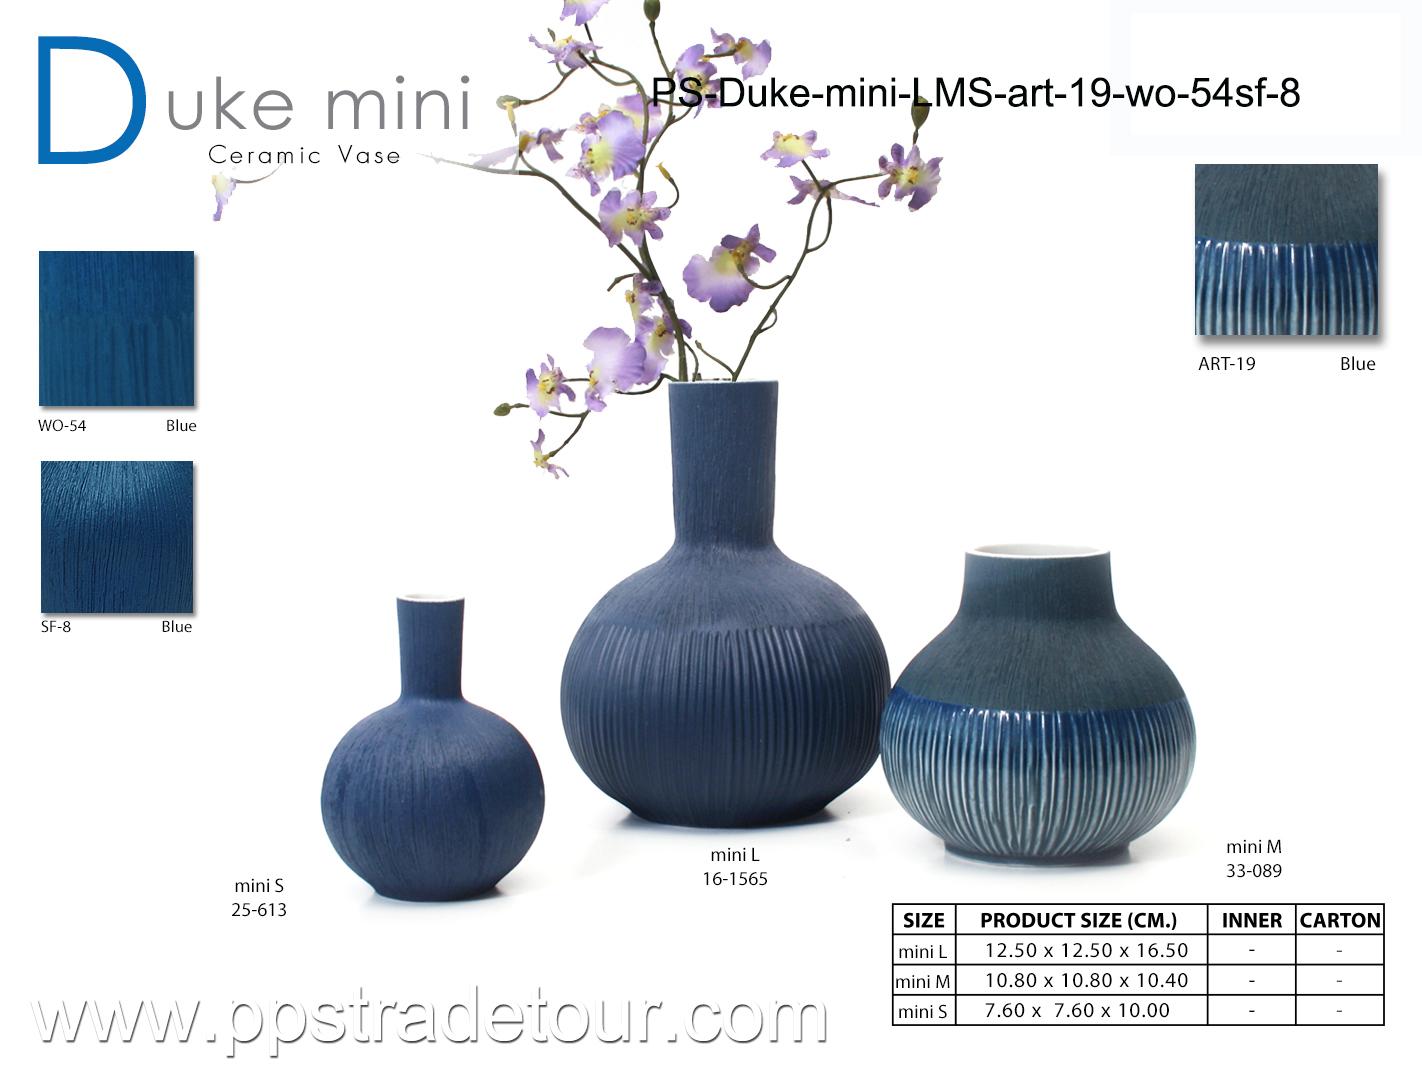 PSCV-Duke-mini-LMS-ART-19-WO-54SF-8